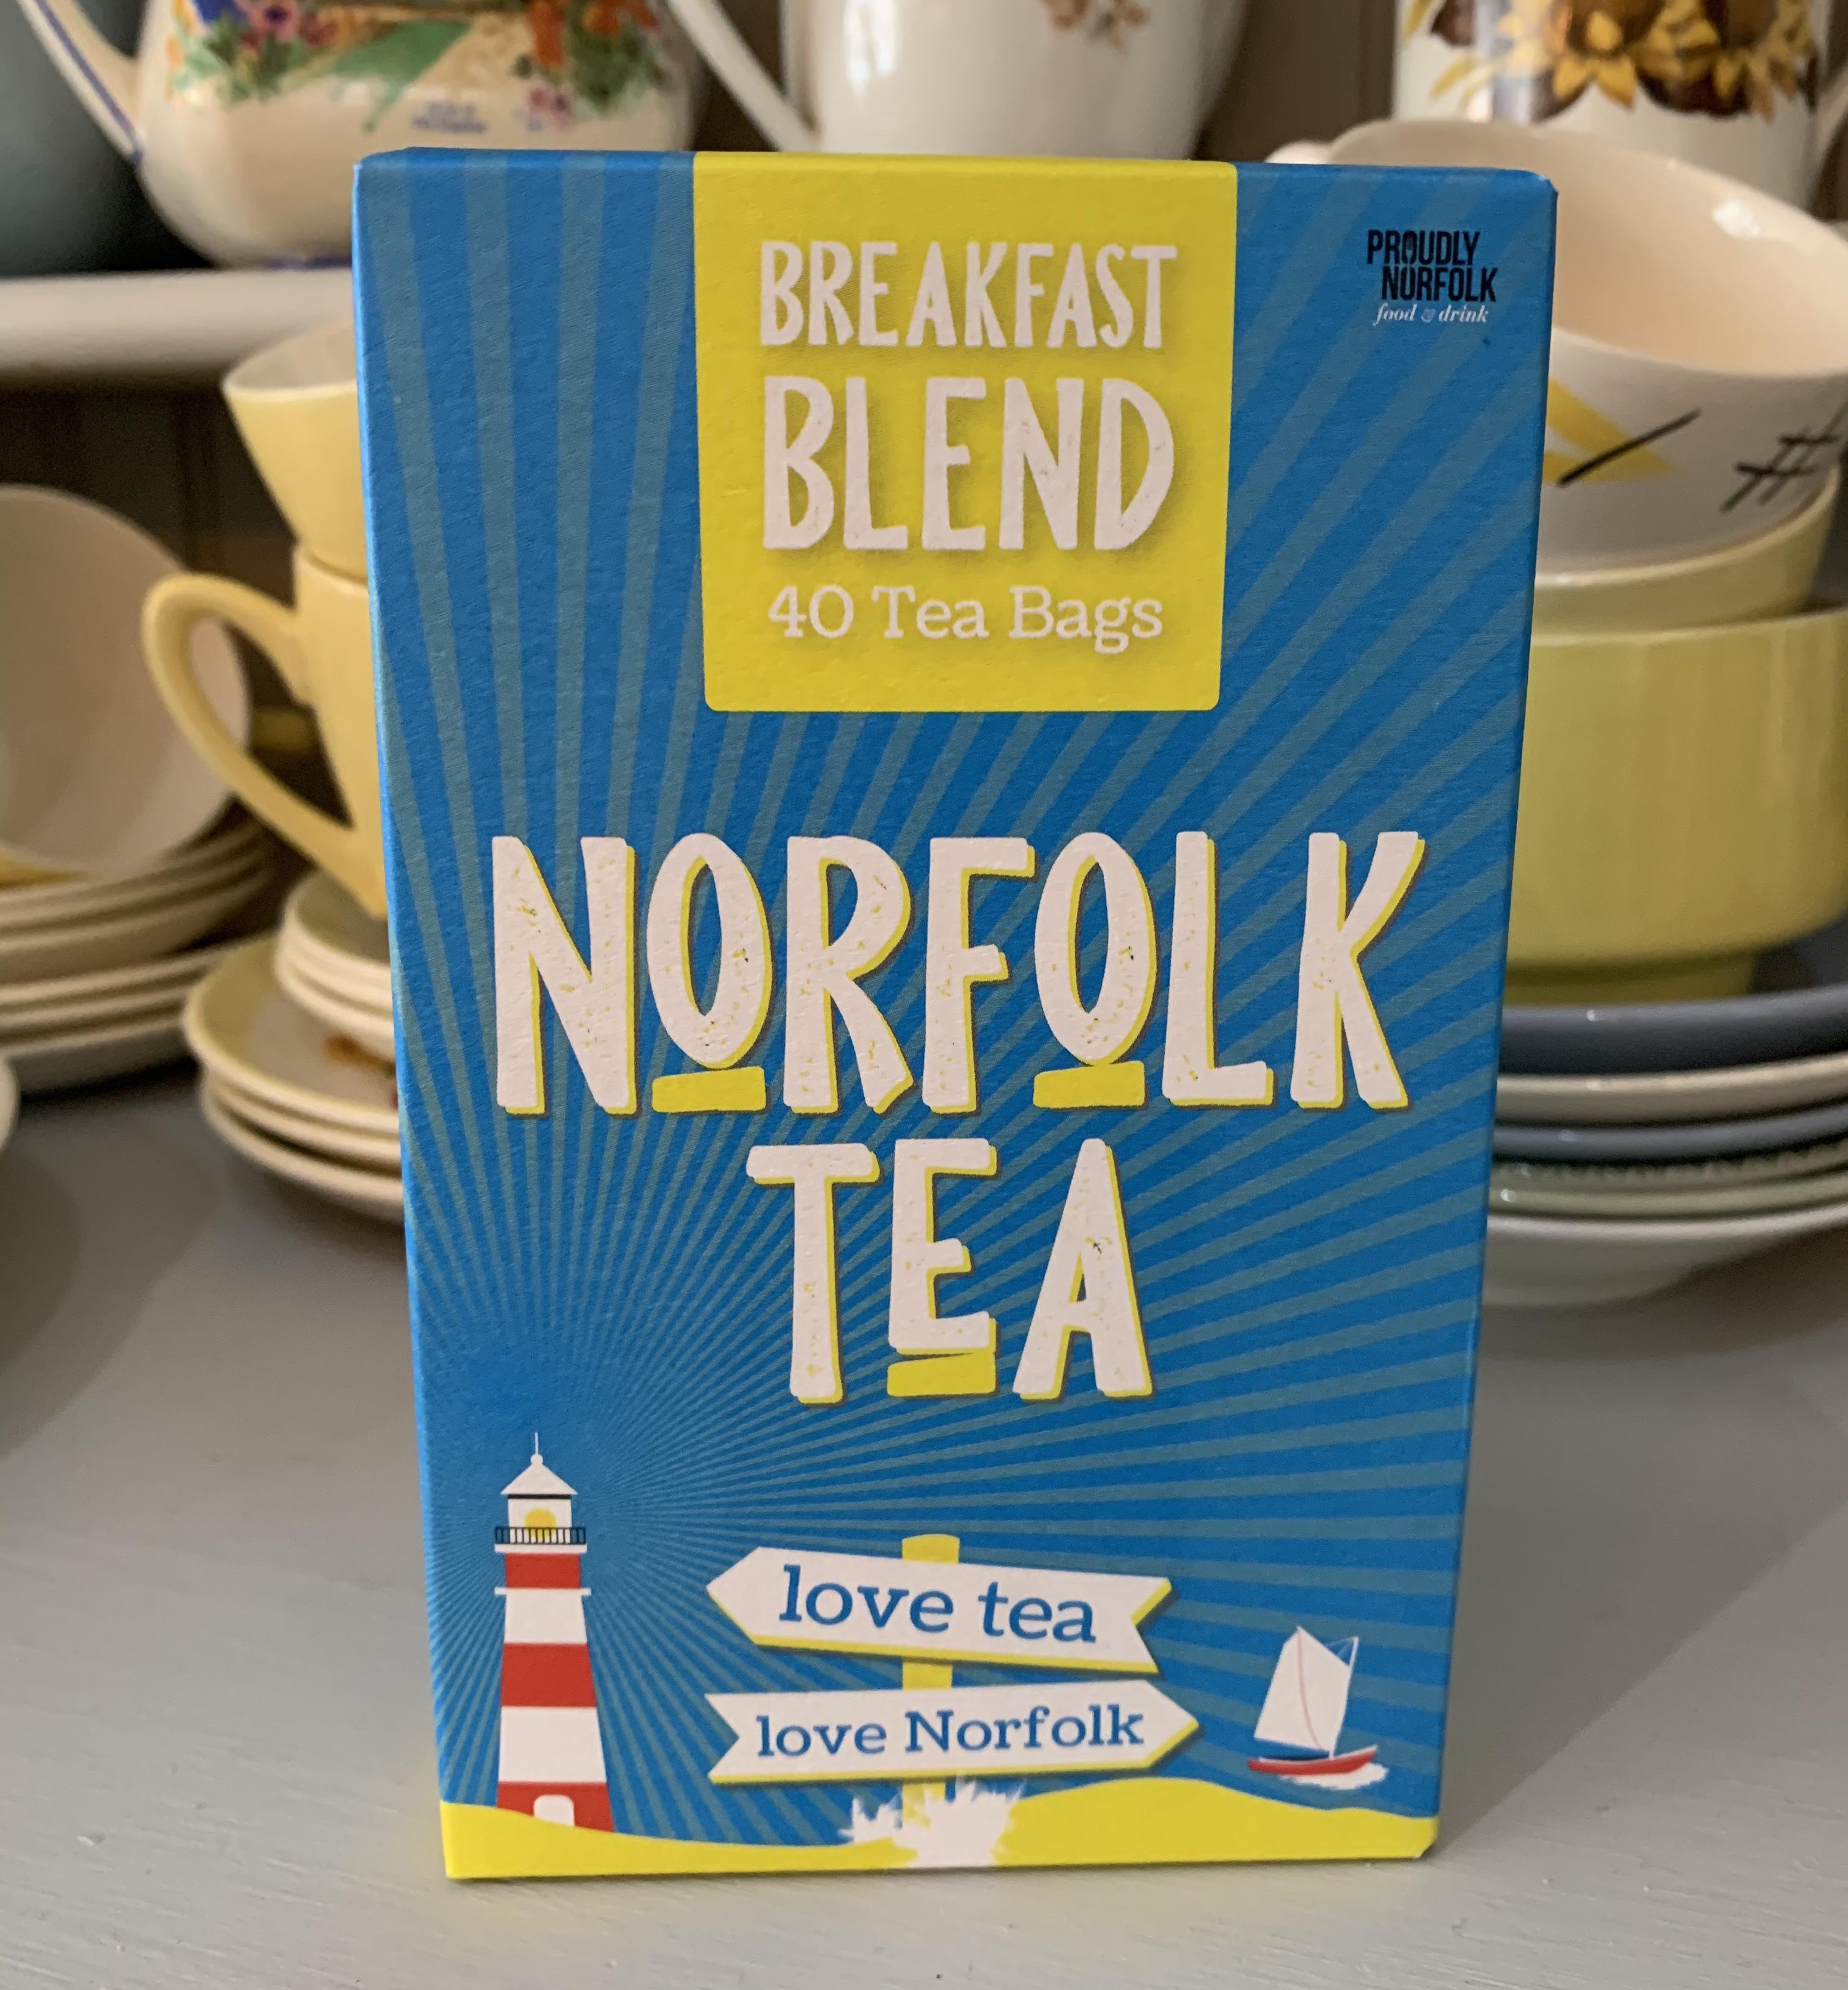 Nelson and Norfolk Breakfast Tea